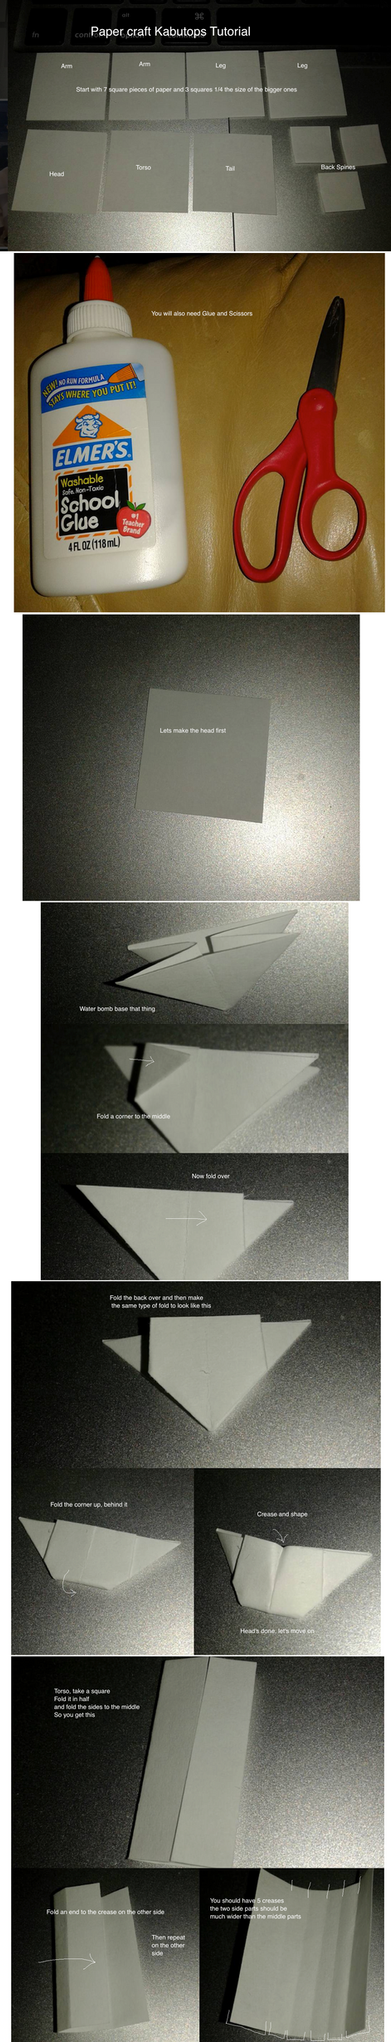 Papercraft Kabutops tutorial 1 by okamitsuki